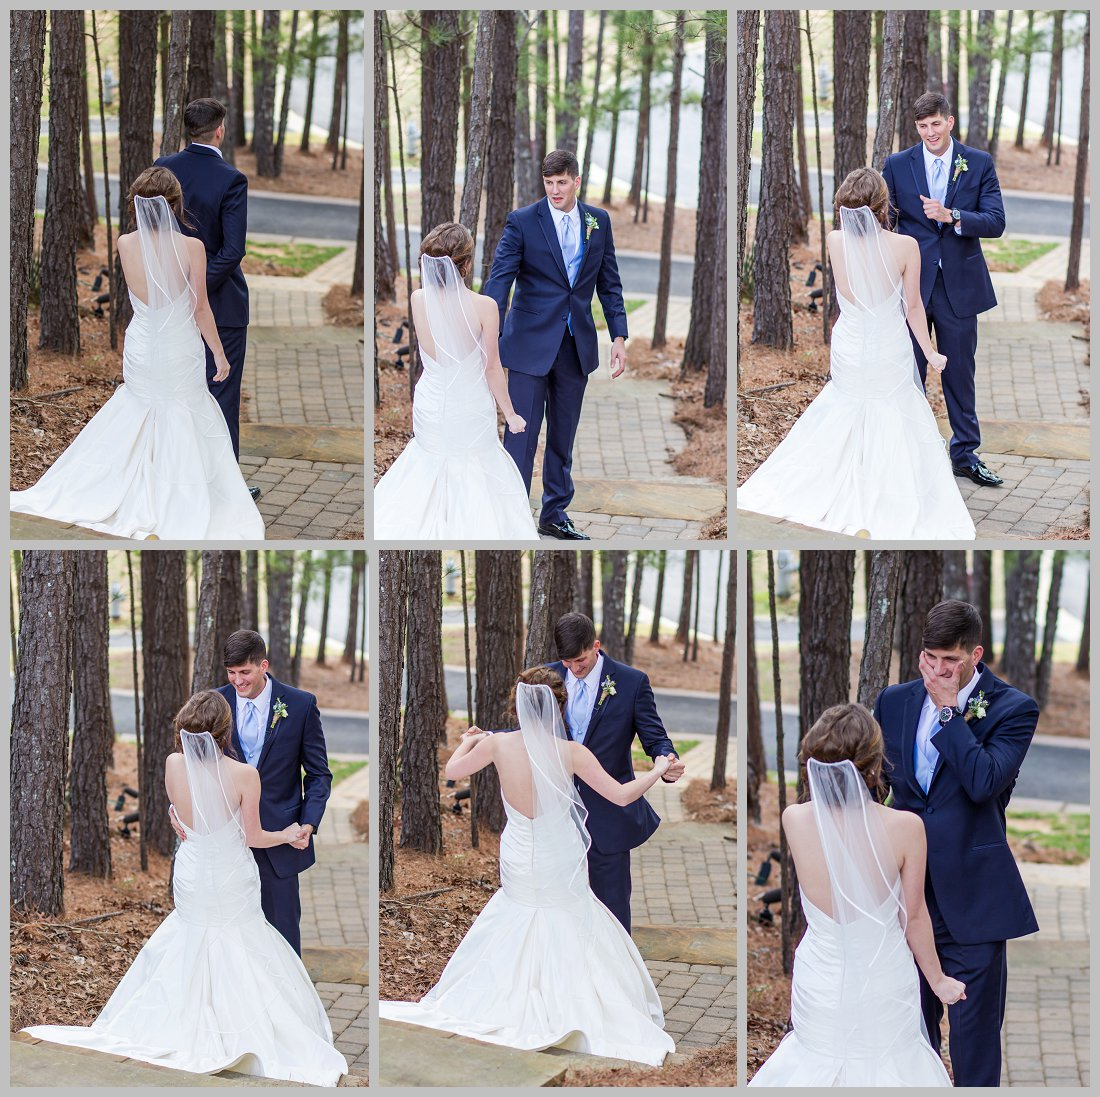 river-club-wedding-first-look-02